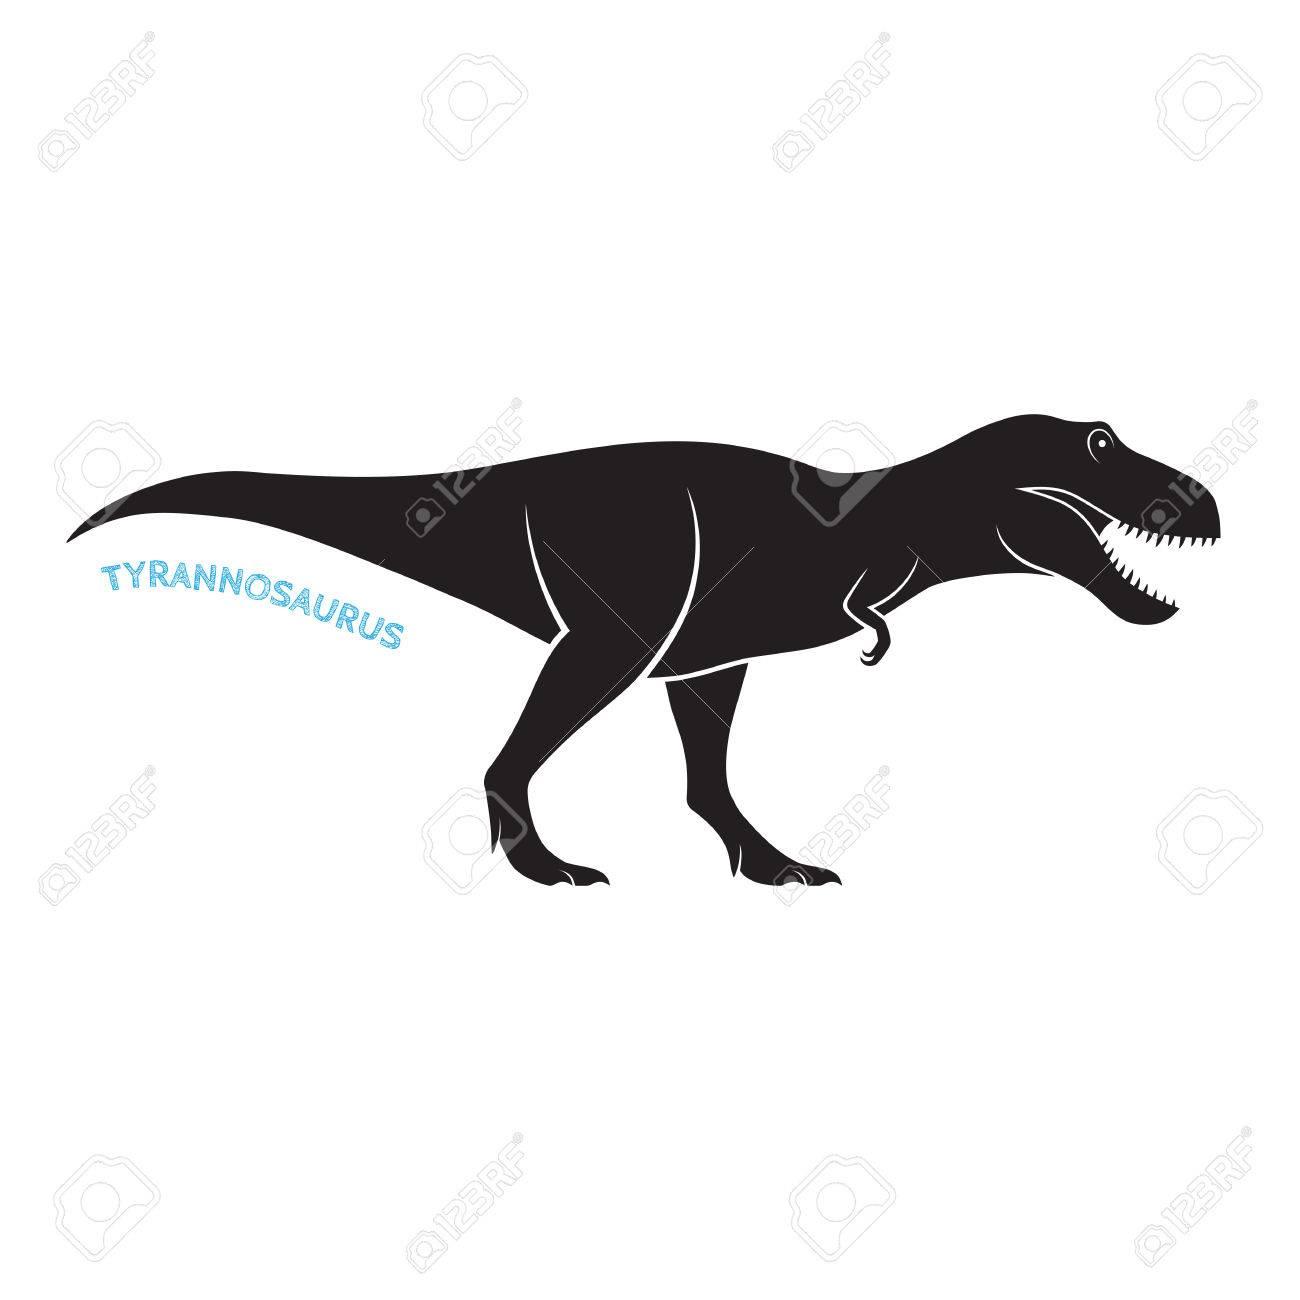 tyrannosaurus silhouette icon emblem on white background t rex rh 123rf com t rex vector art t rex vector free